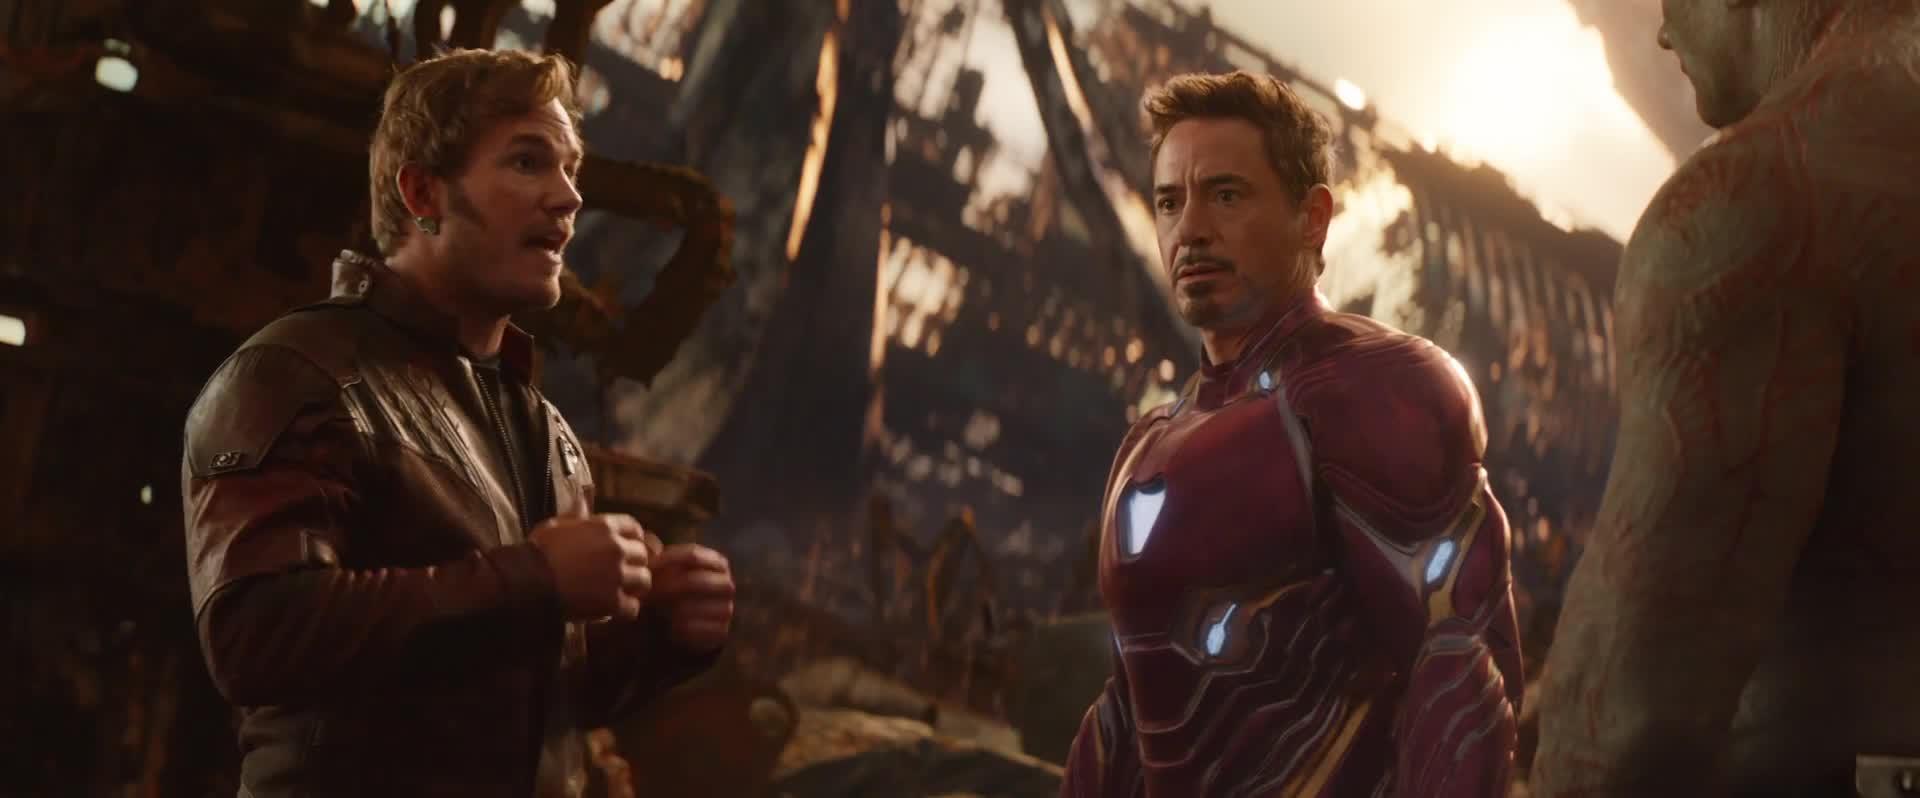 avengers infinity war full movie in hindi worldfree4u